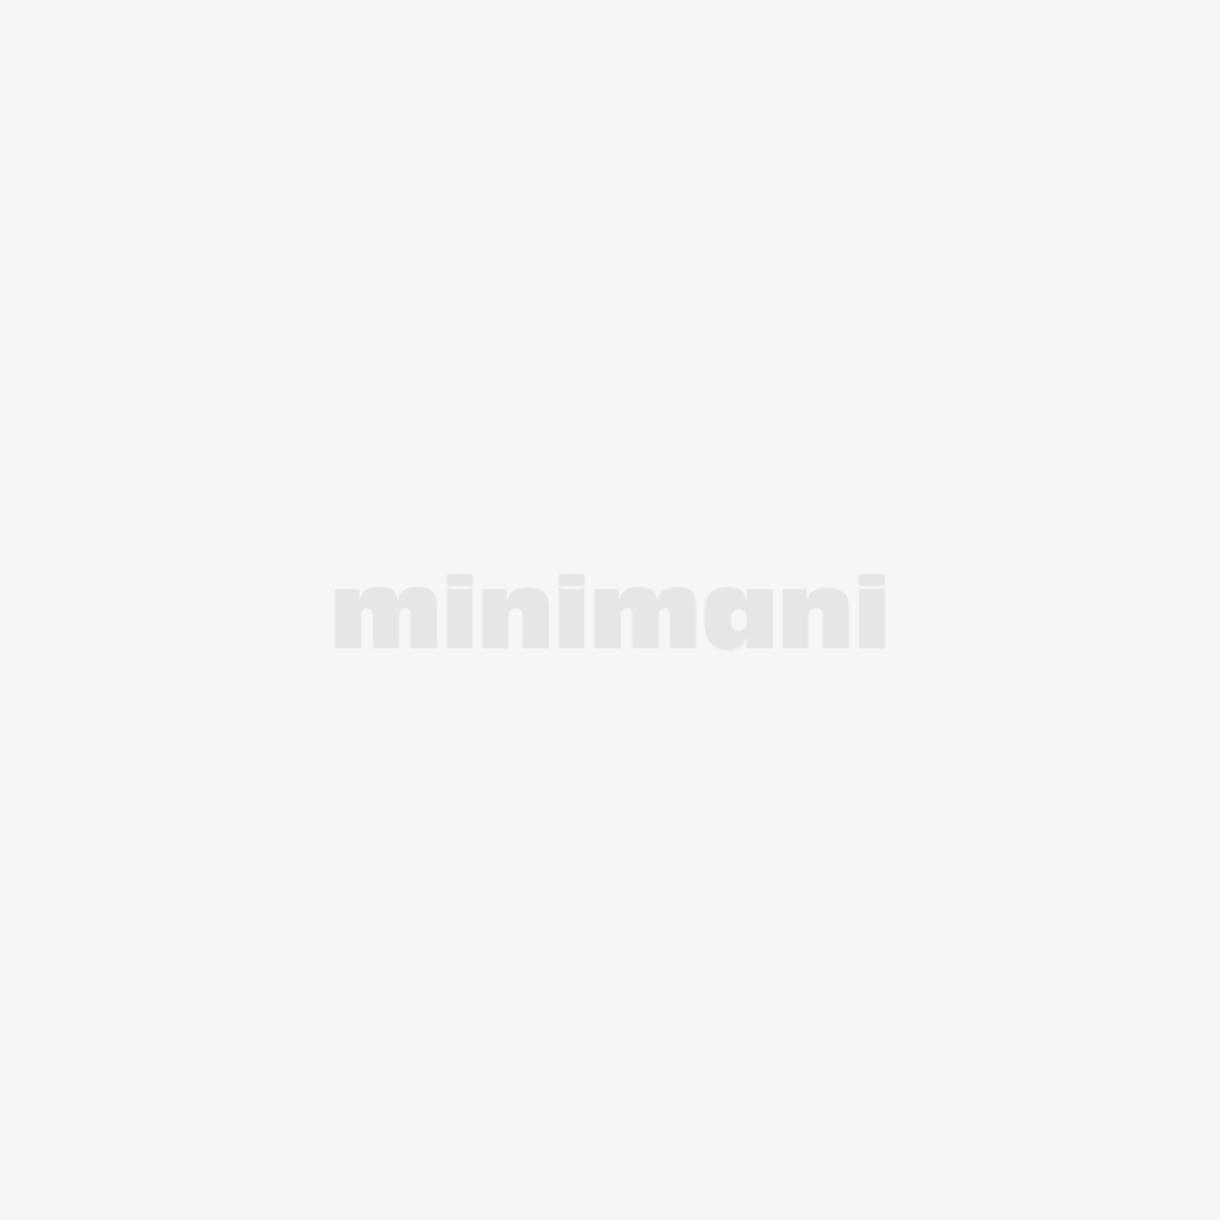 CROSSBOW NAISTEN LEGGINGS 2KPL/PKT, MUSTA 50/52